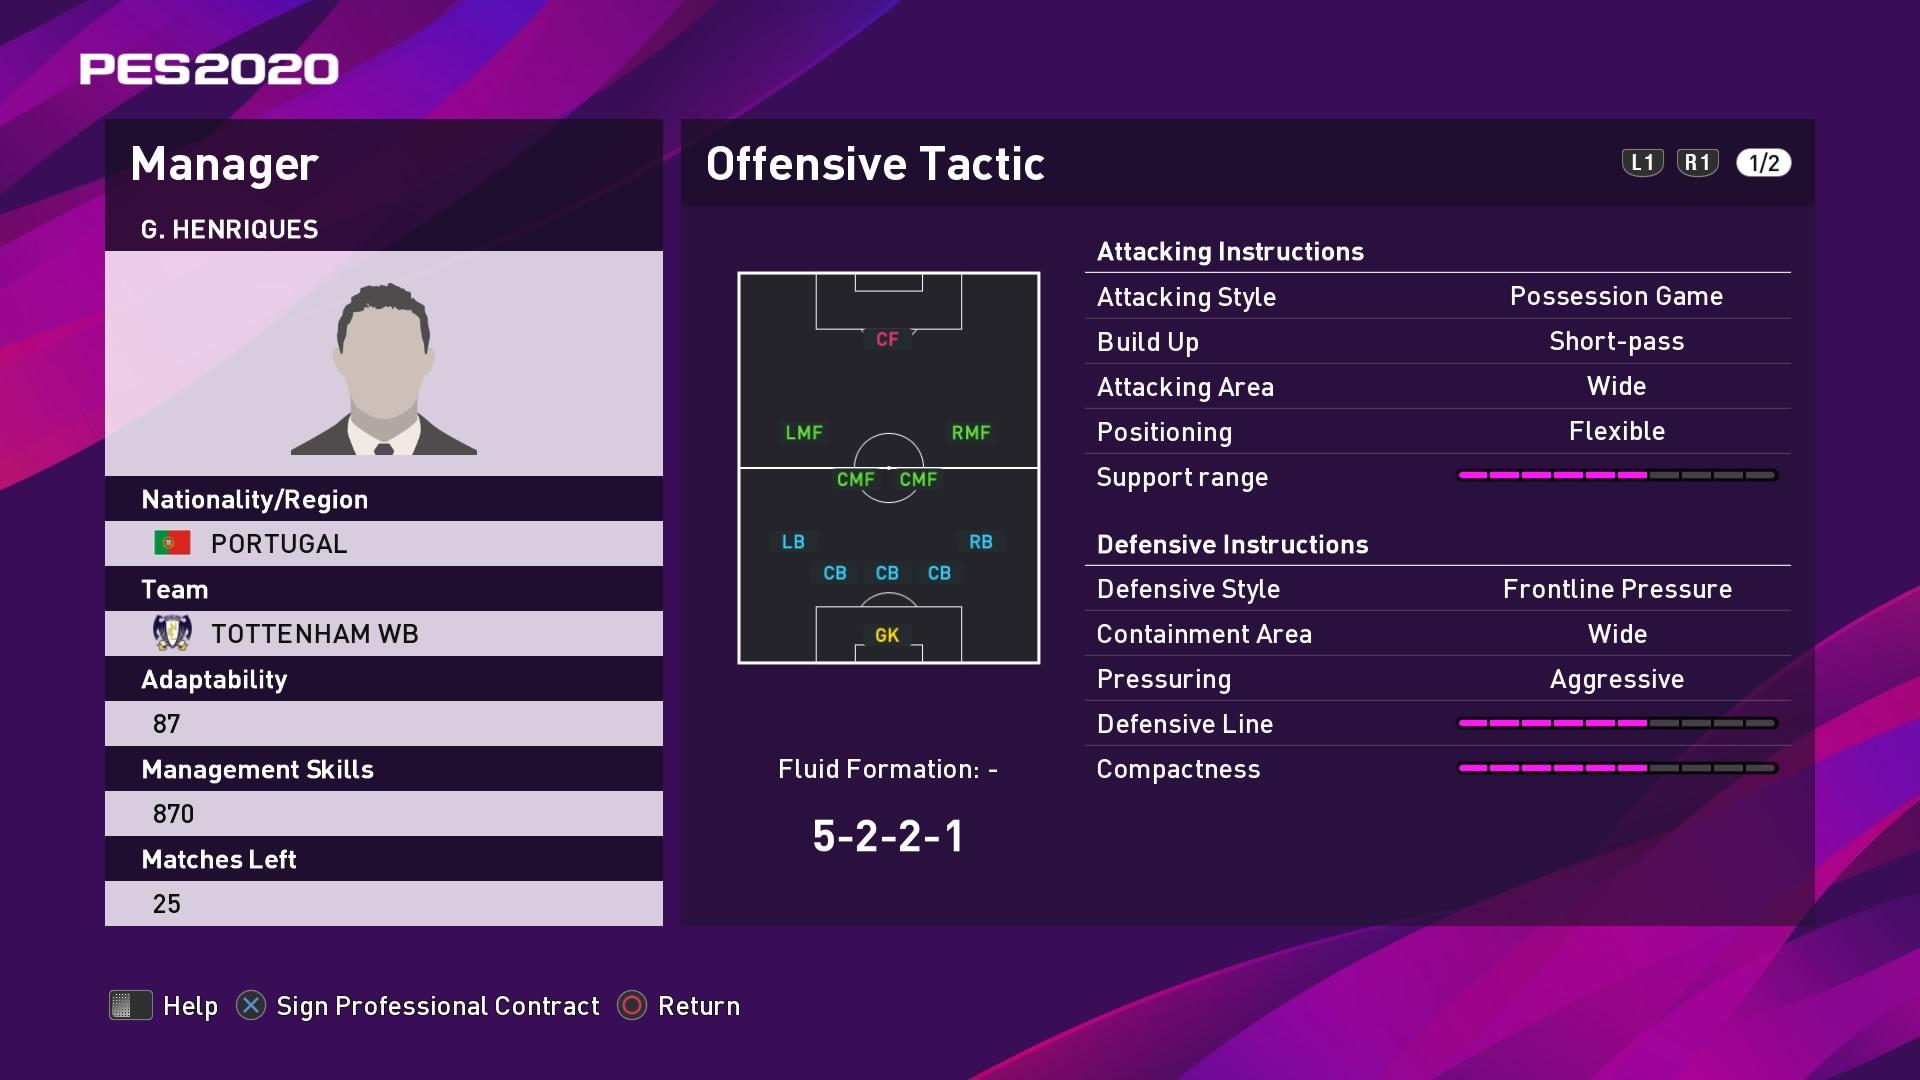 G. Henriques (3) (José Mourinho) Offensive Tactic in PES 2020 myClub